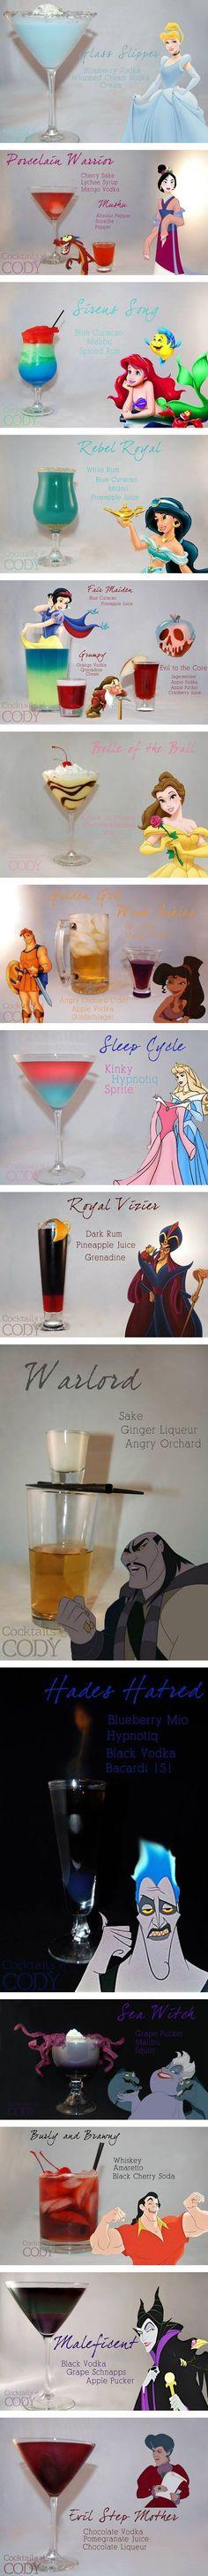 Disney Princess-Themed Cocktails